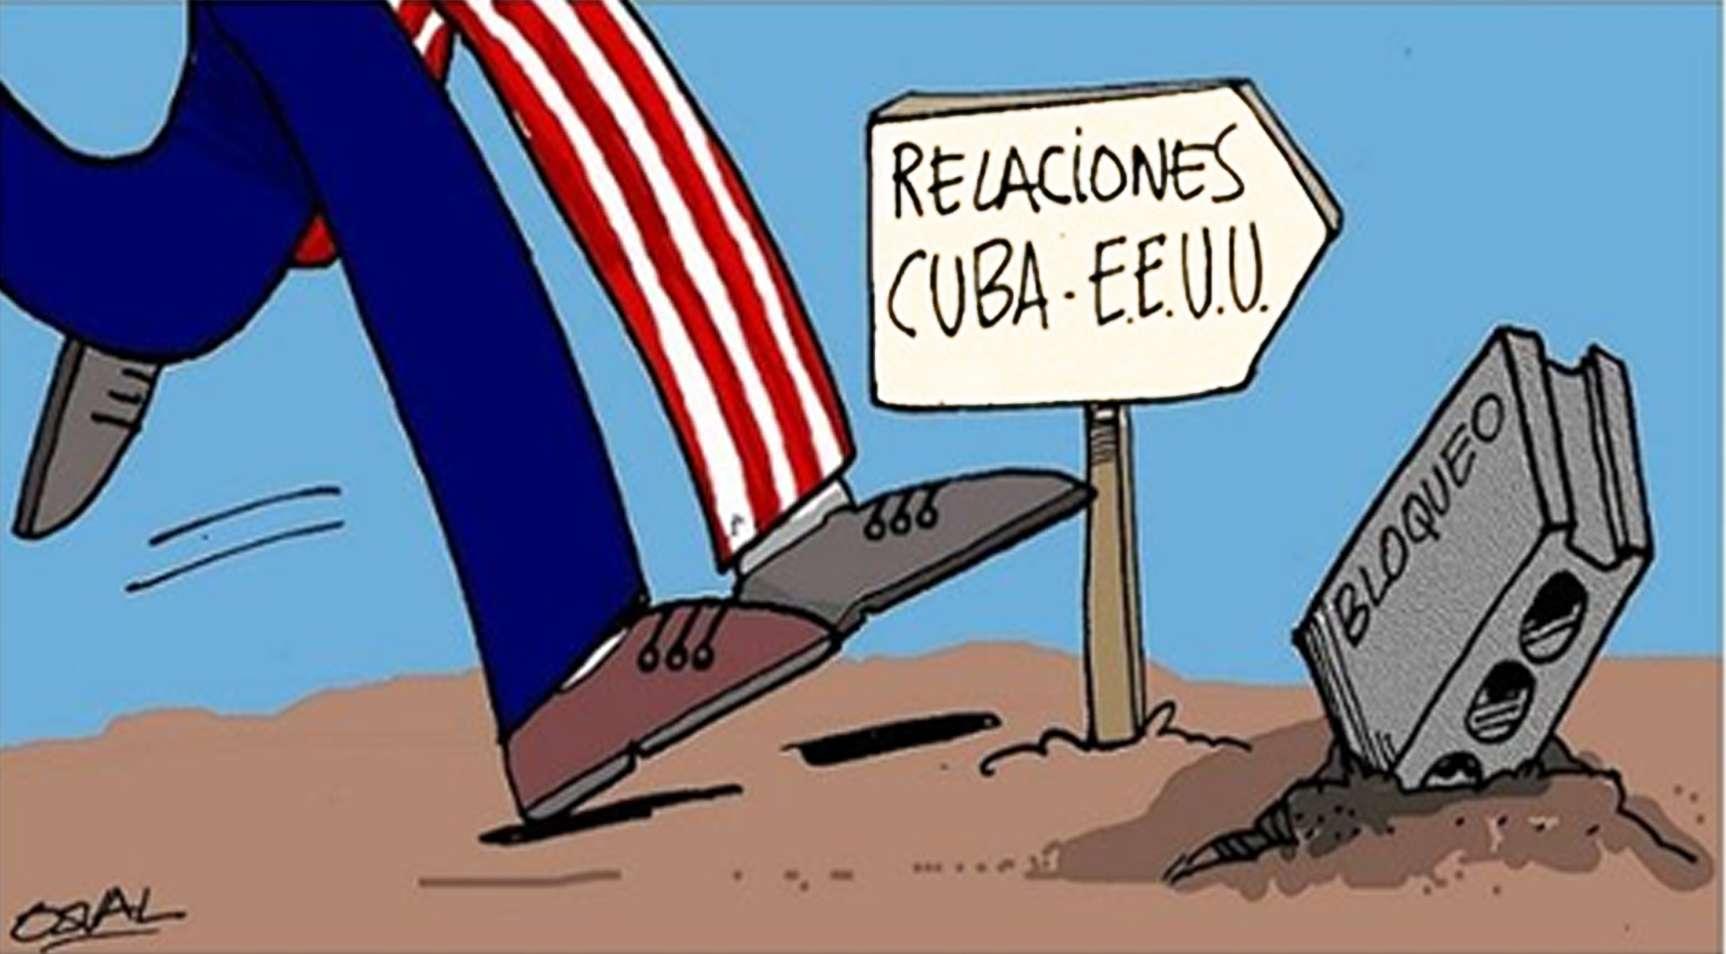 Historia Cuba denuncia el bloqueo de EE UU